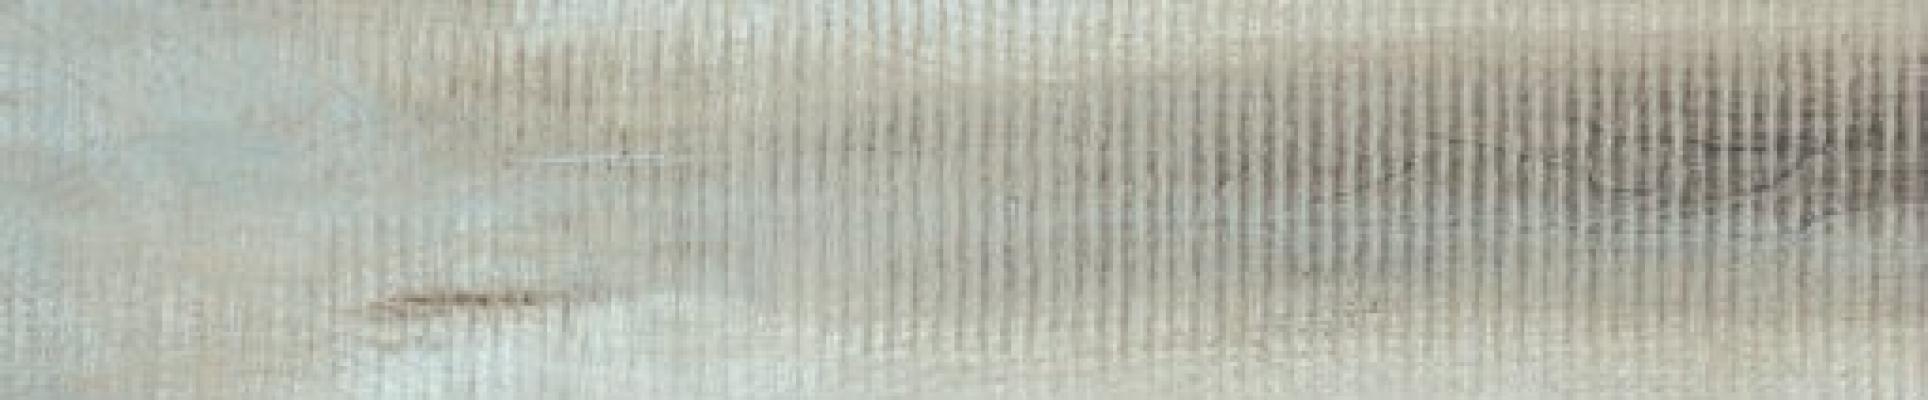 VU3011 GREY SAW CUT